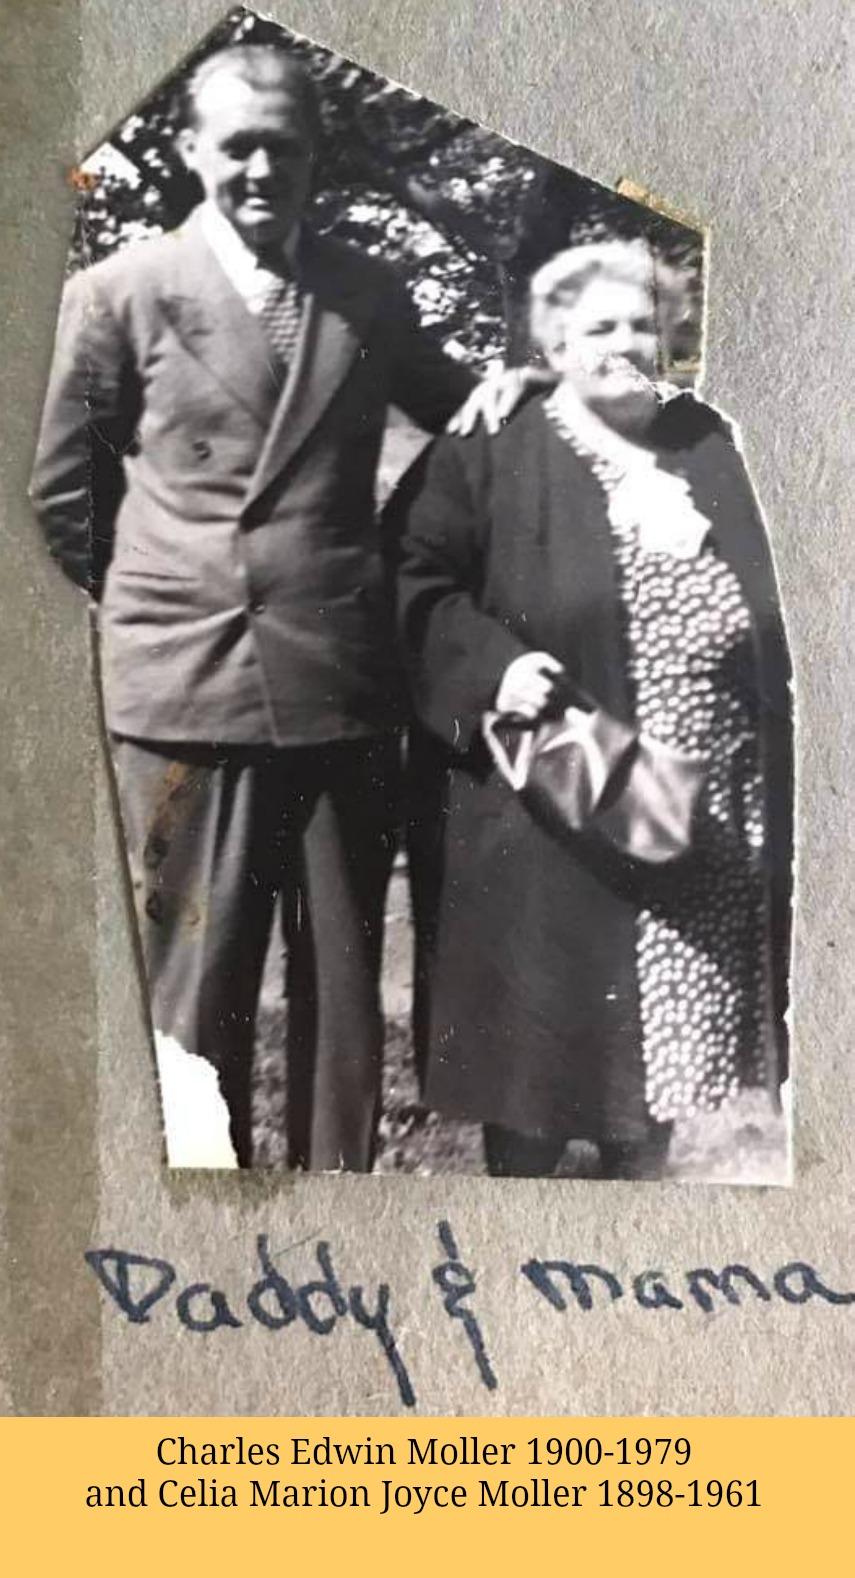 Charles and Celia Moller